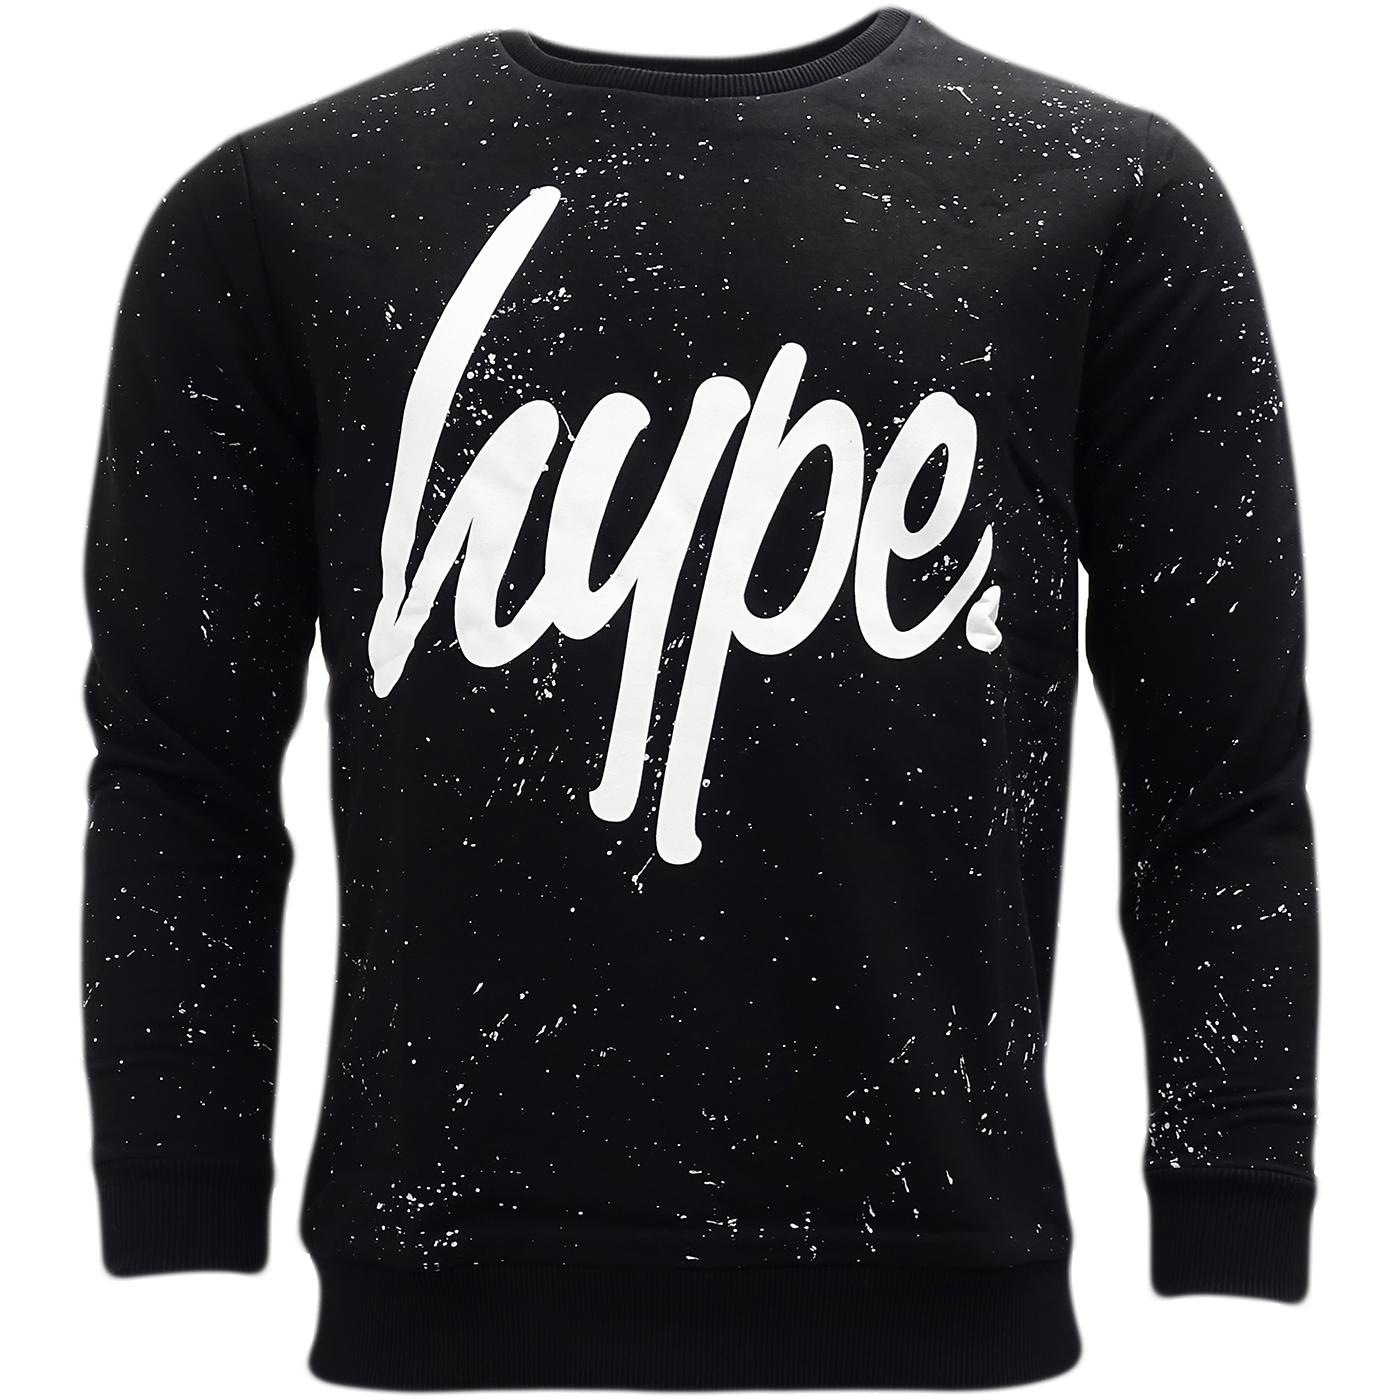 Hype Black All Over Speckle Sweatshirt Jumper